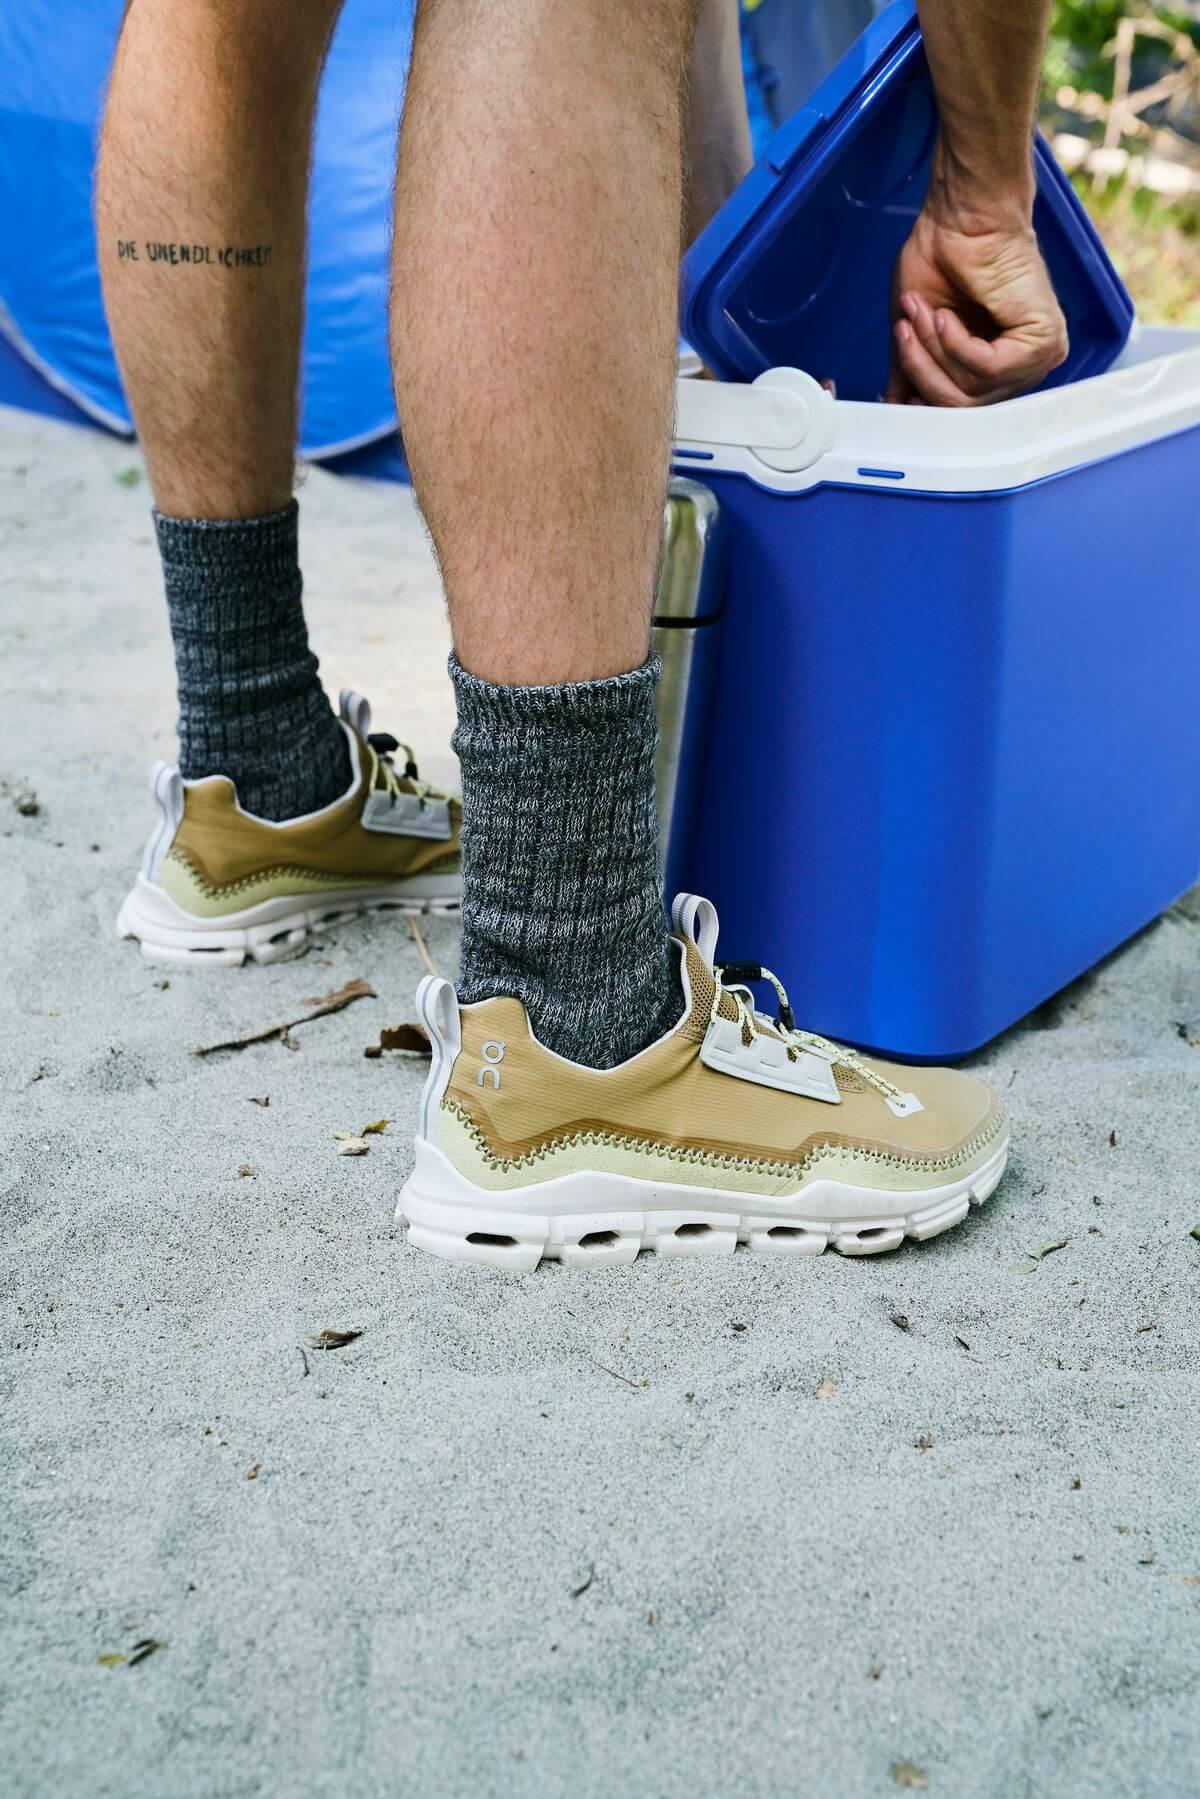 on feet - On Cloudaway - ein Hybrid-Outdoor-Schuh/Sneaker